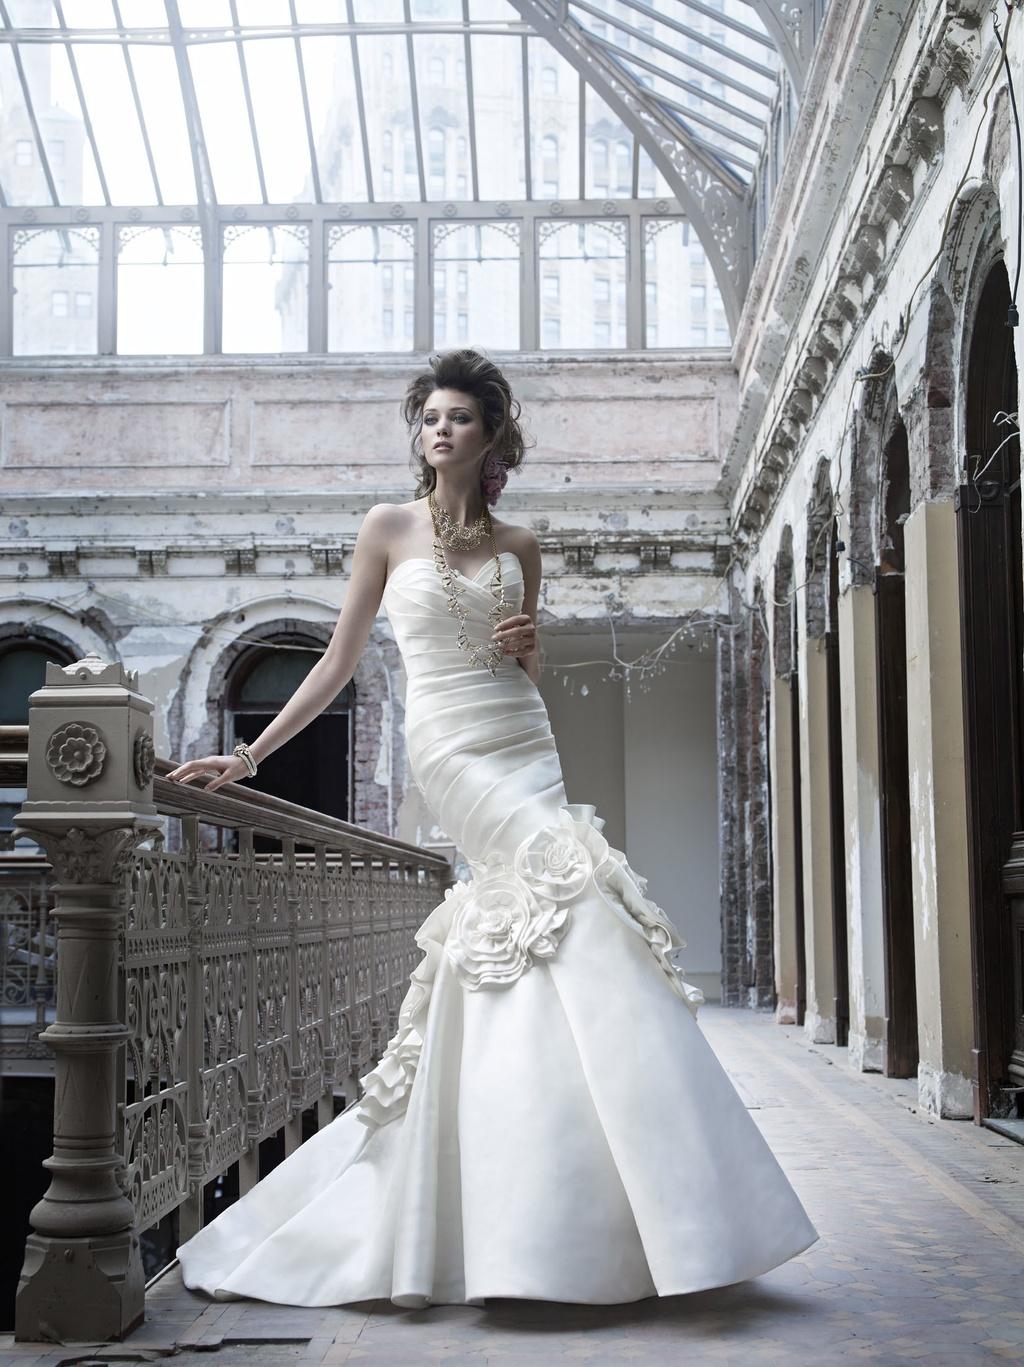 Wedding-dress-fall-2011-bridal-gowns-lazaro-3164-front.full